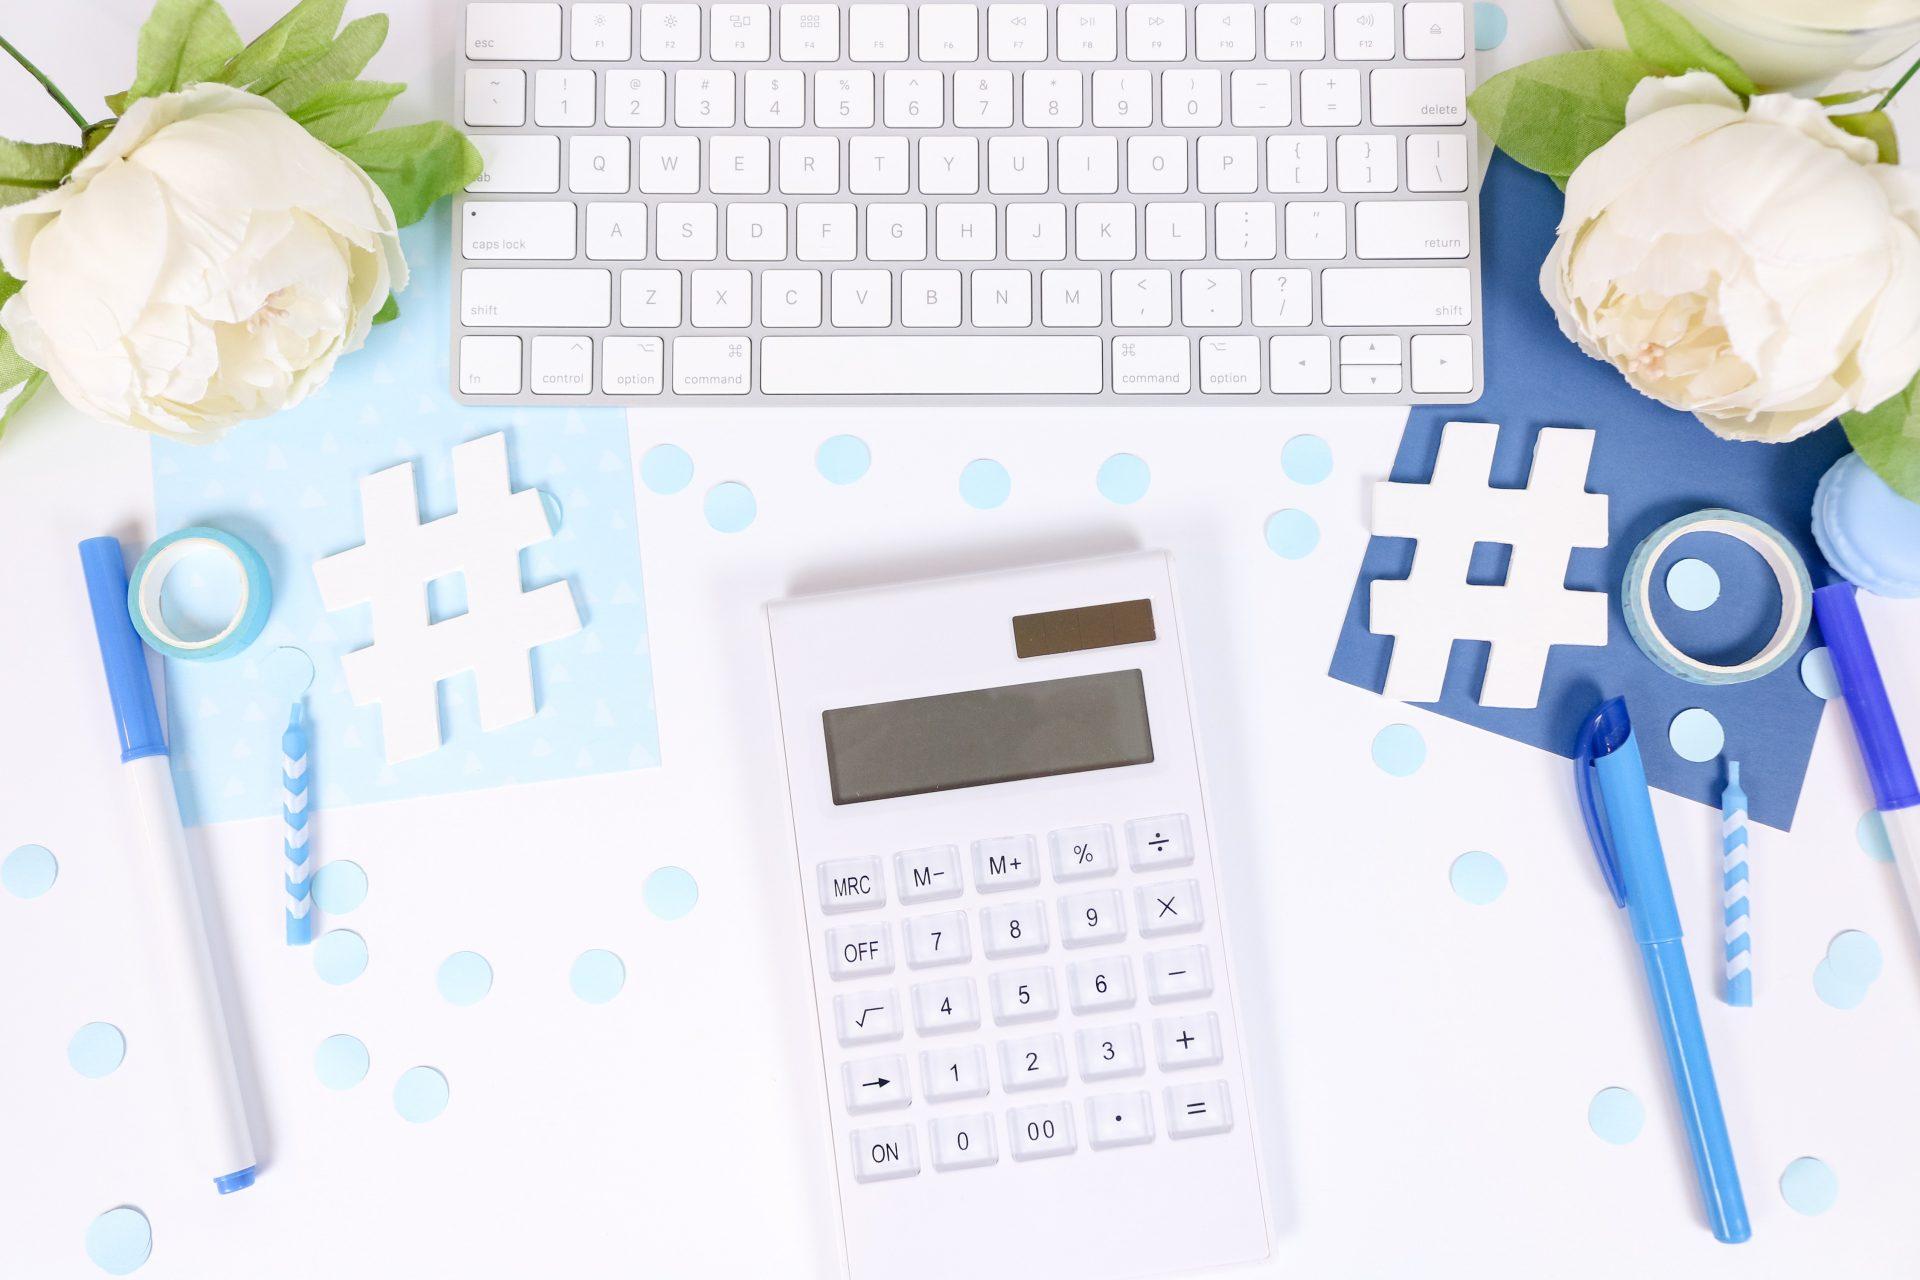 hashtag symbols near computer and calculator